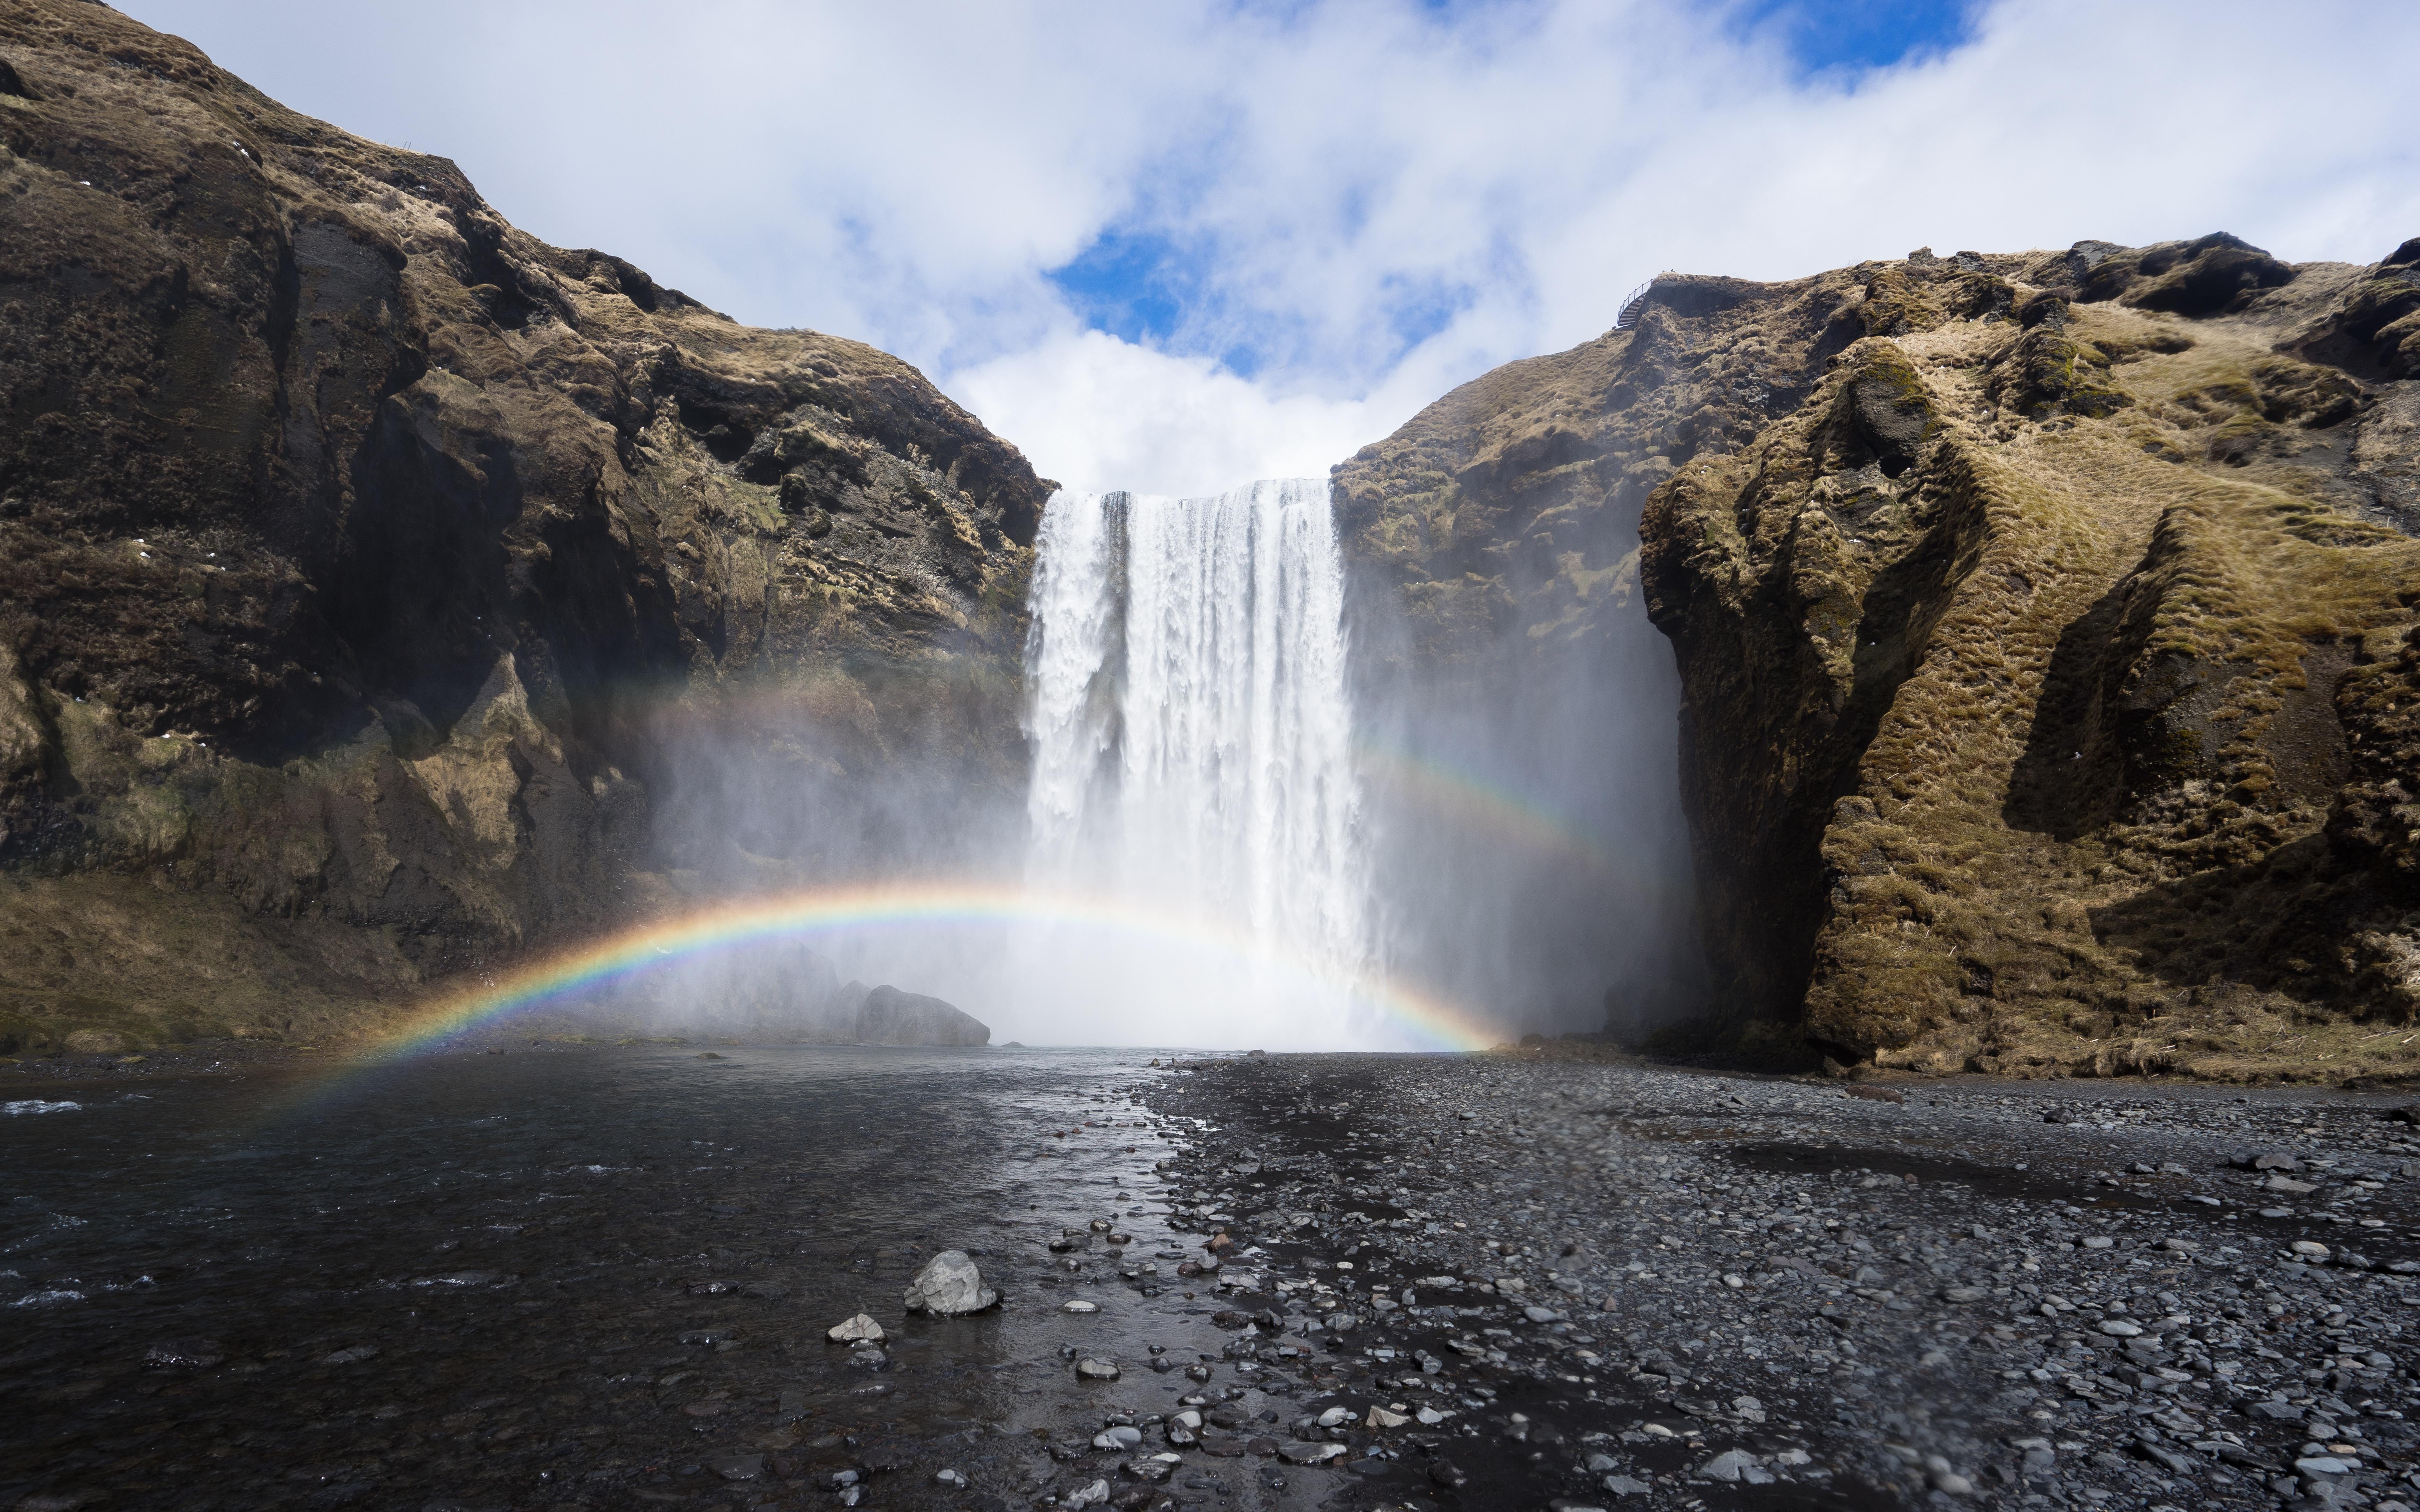 The rainbow below the waterfall photo